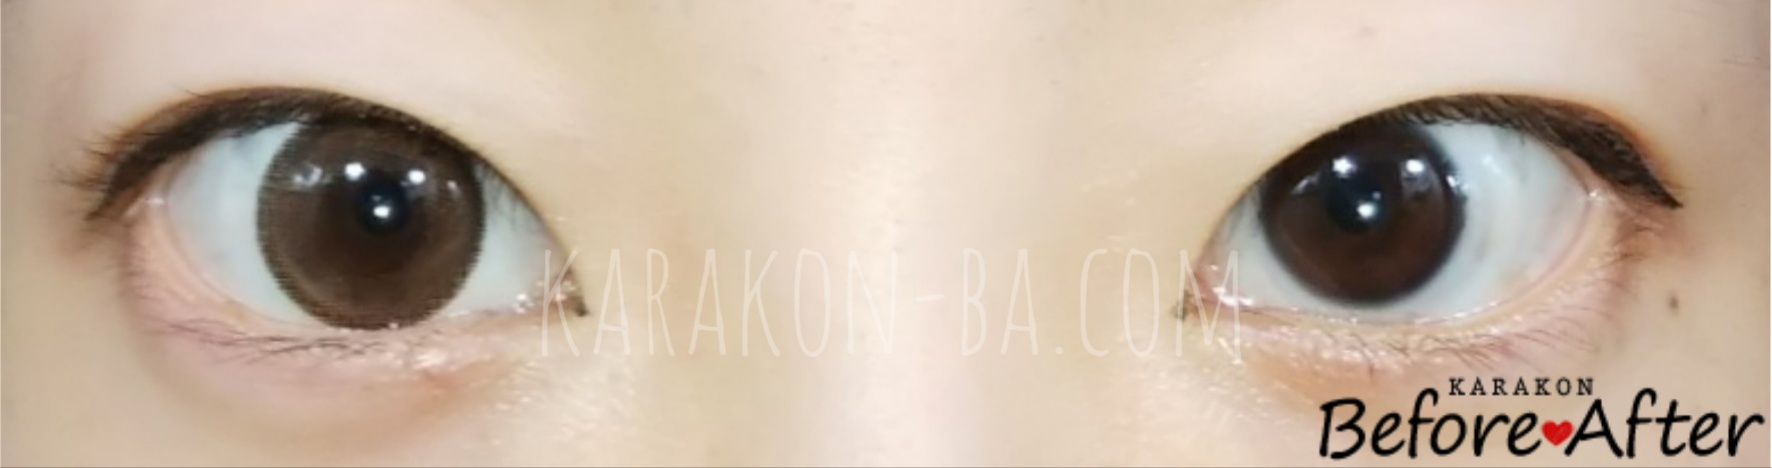 【NEW】クリアキャメルのカラコン装着画像/裸眼と比較